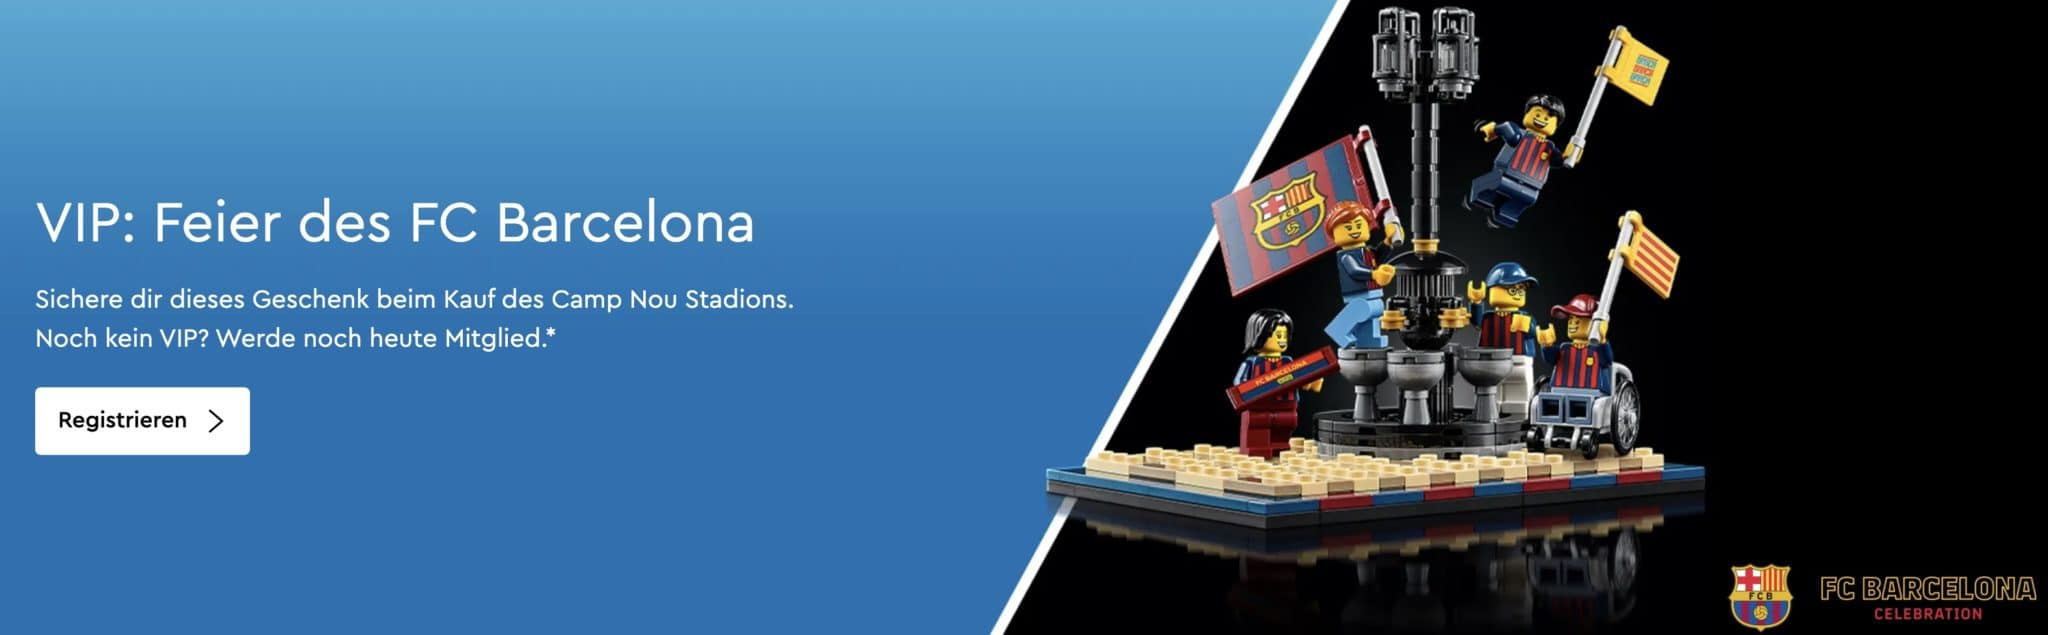 LEGO Aktion Feier Des Fc Barcelona